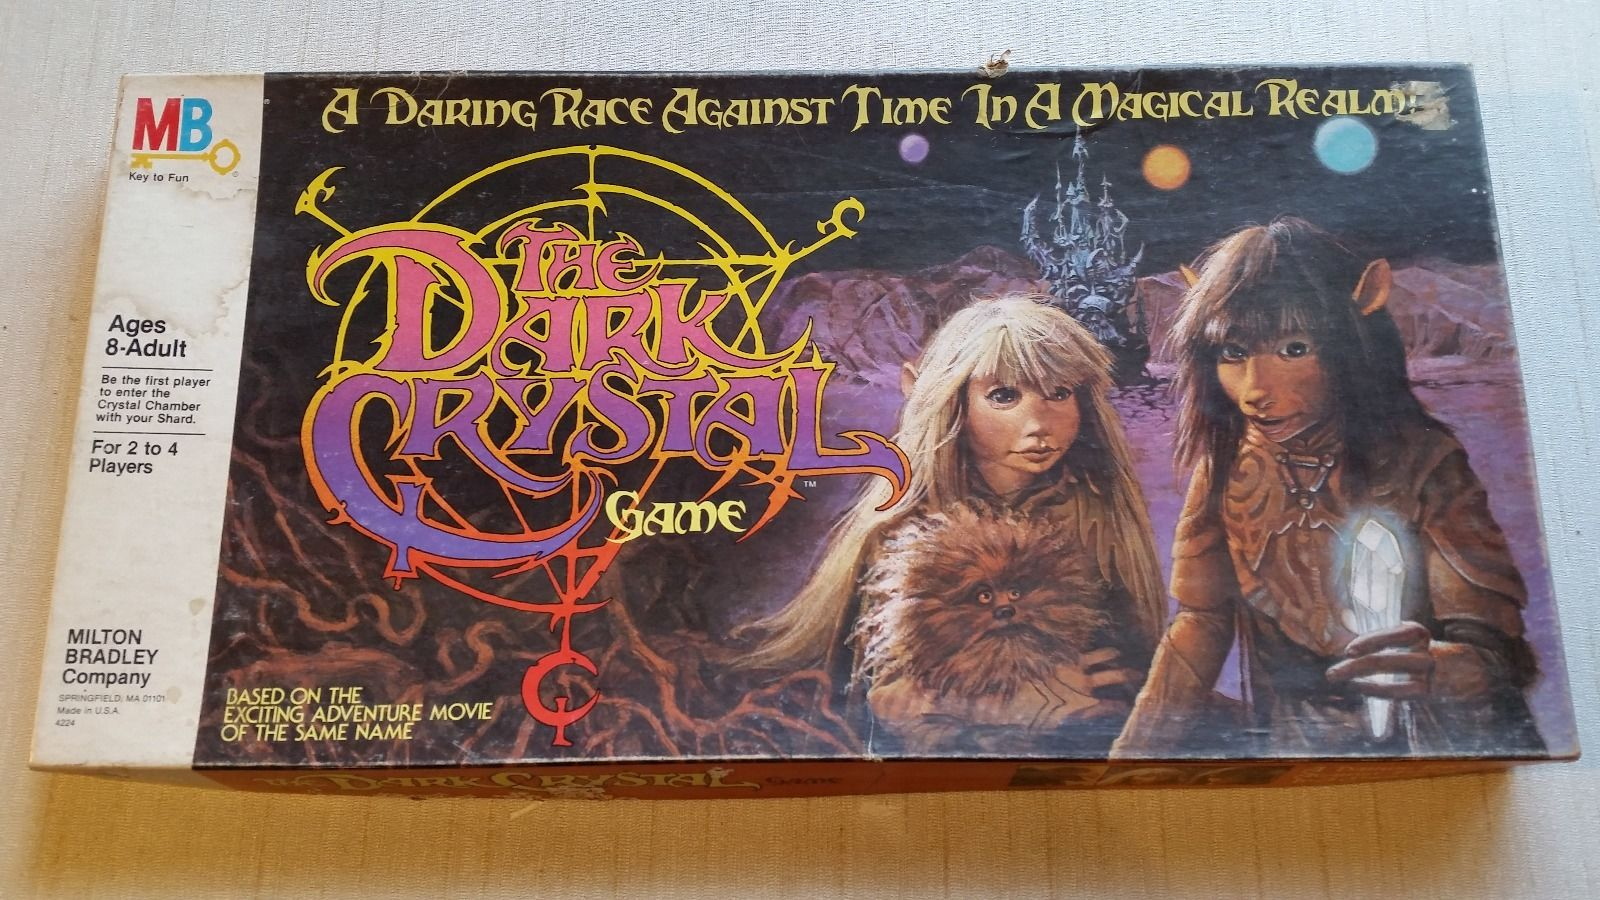 The Dark Crystal Game